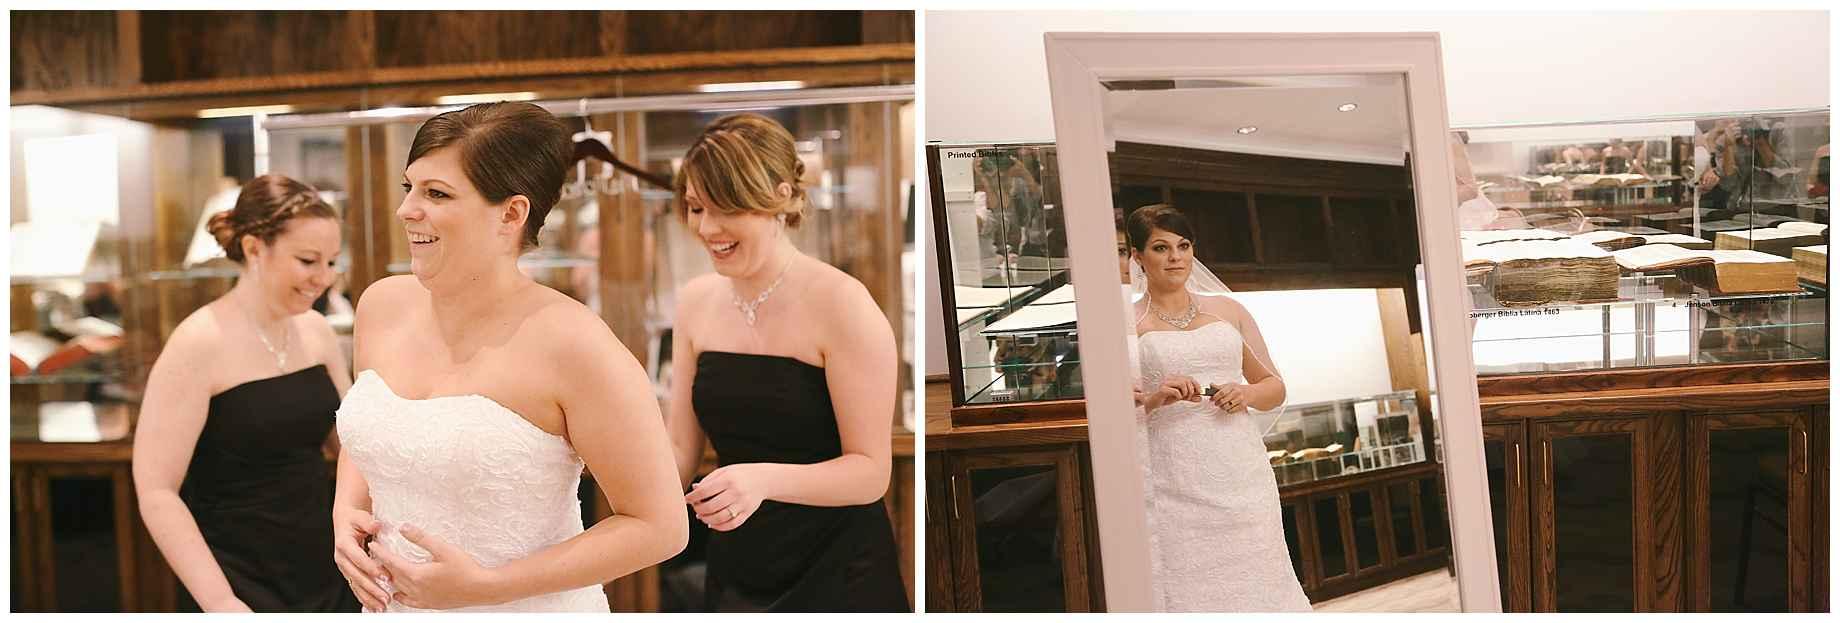 museum-of-biblical-art-wedding-photos-03